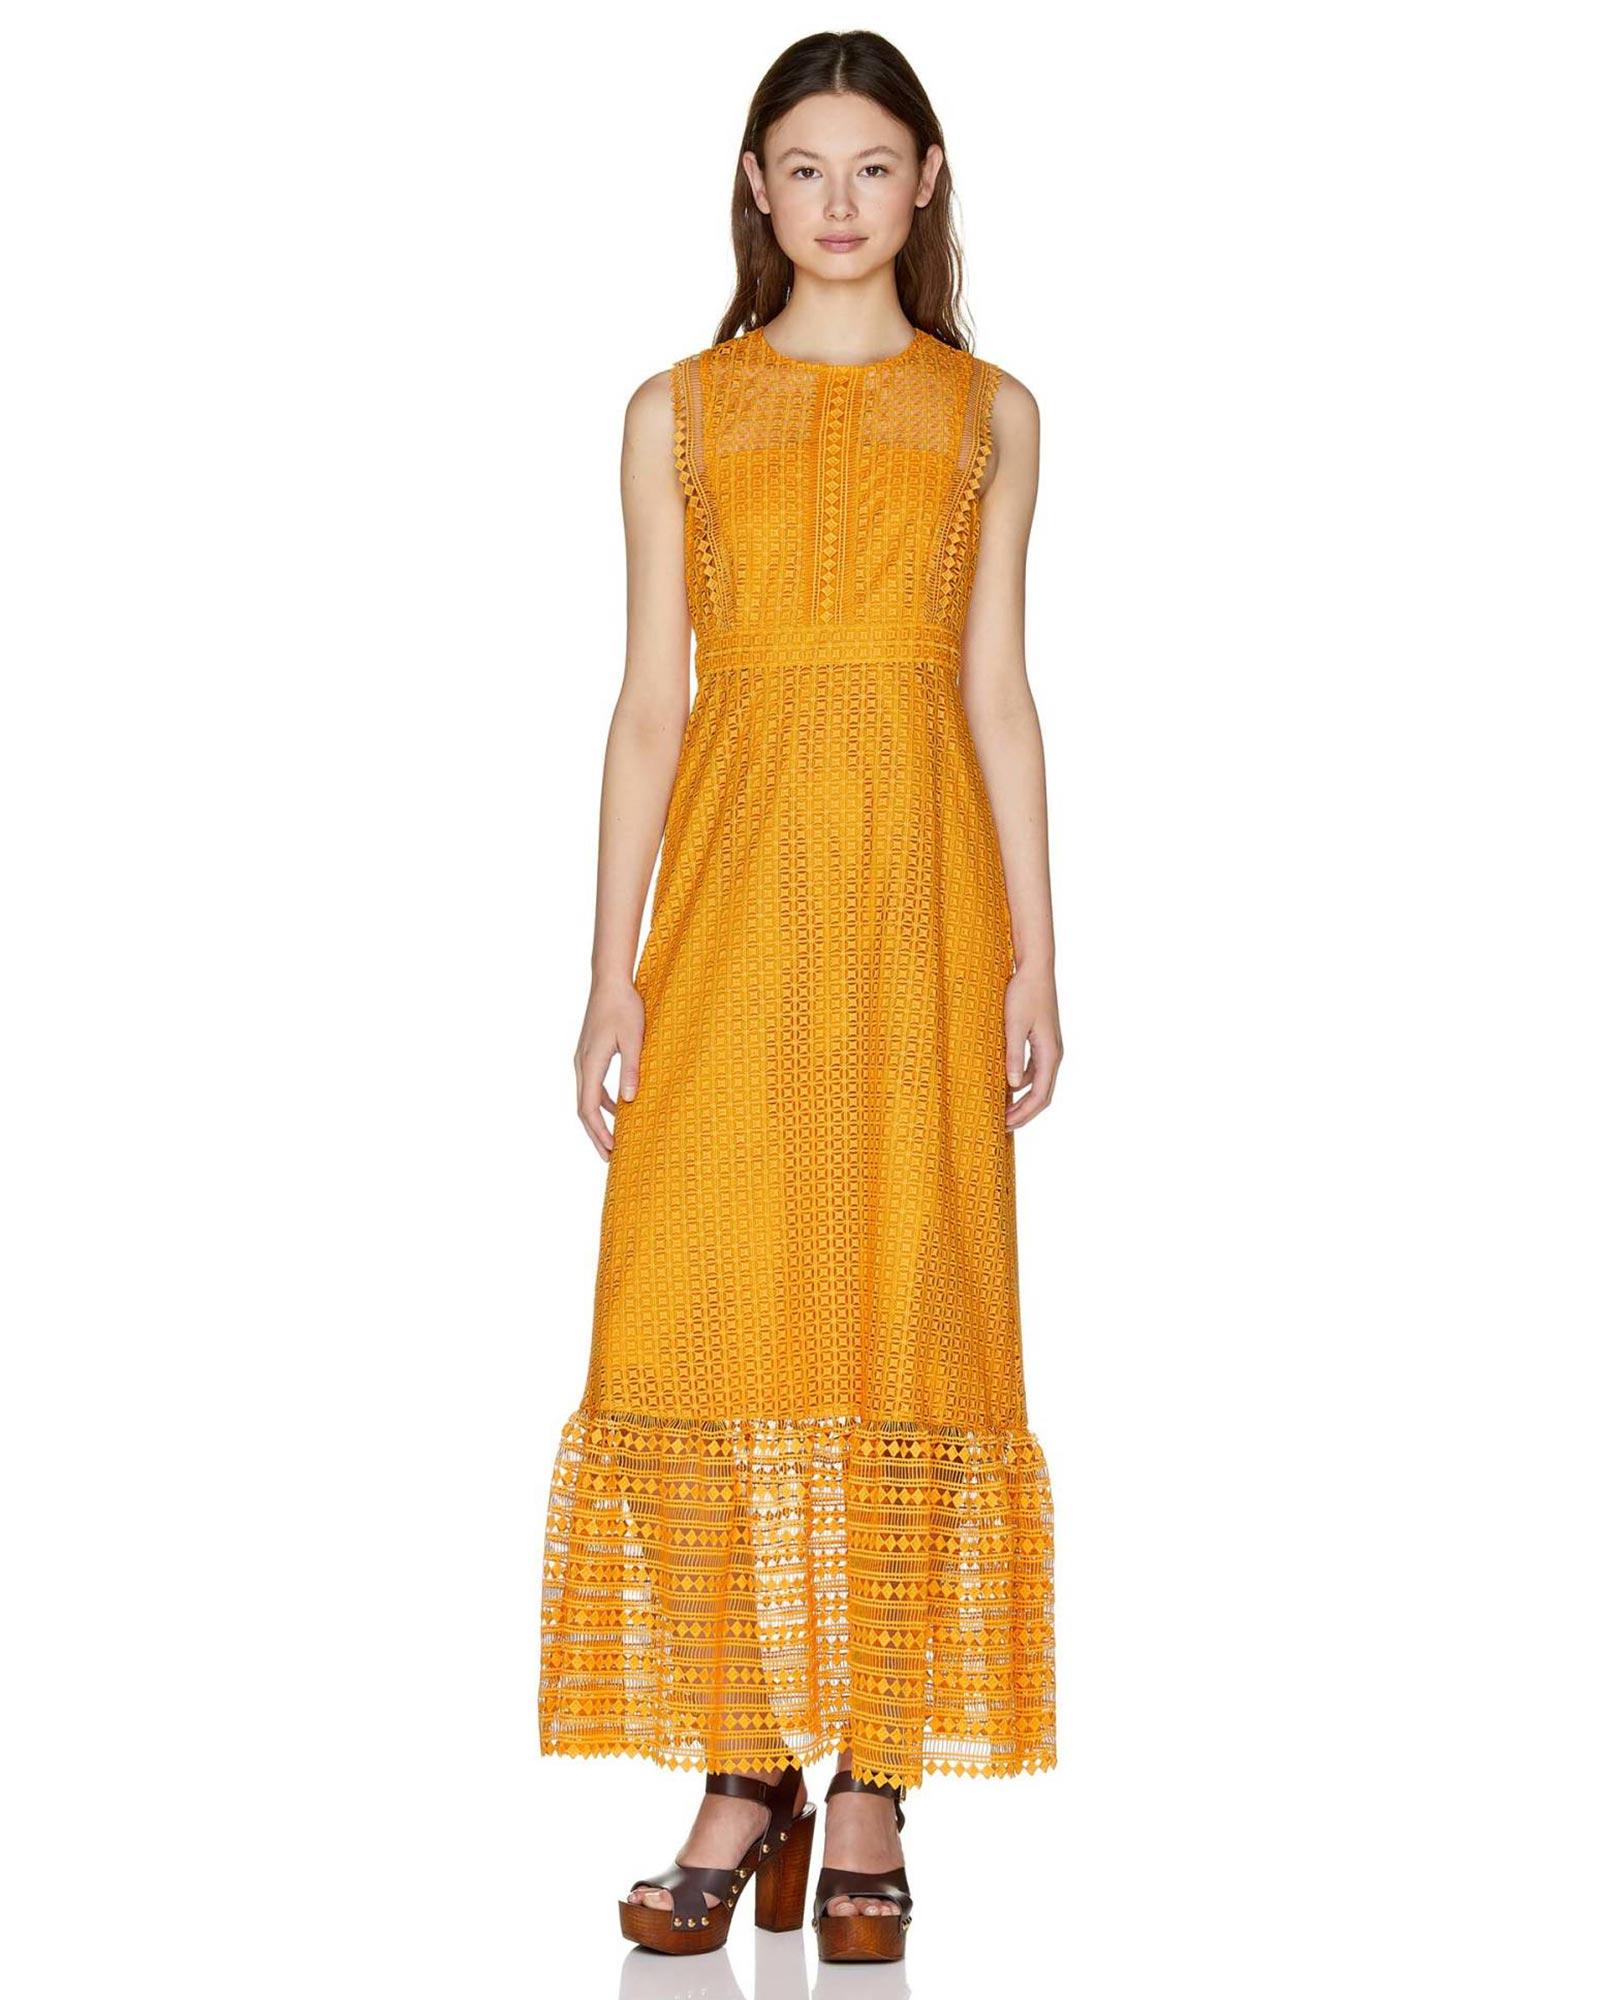 Vestidos benetton mujer 2019